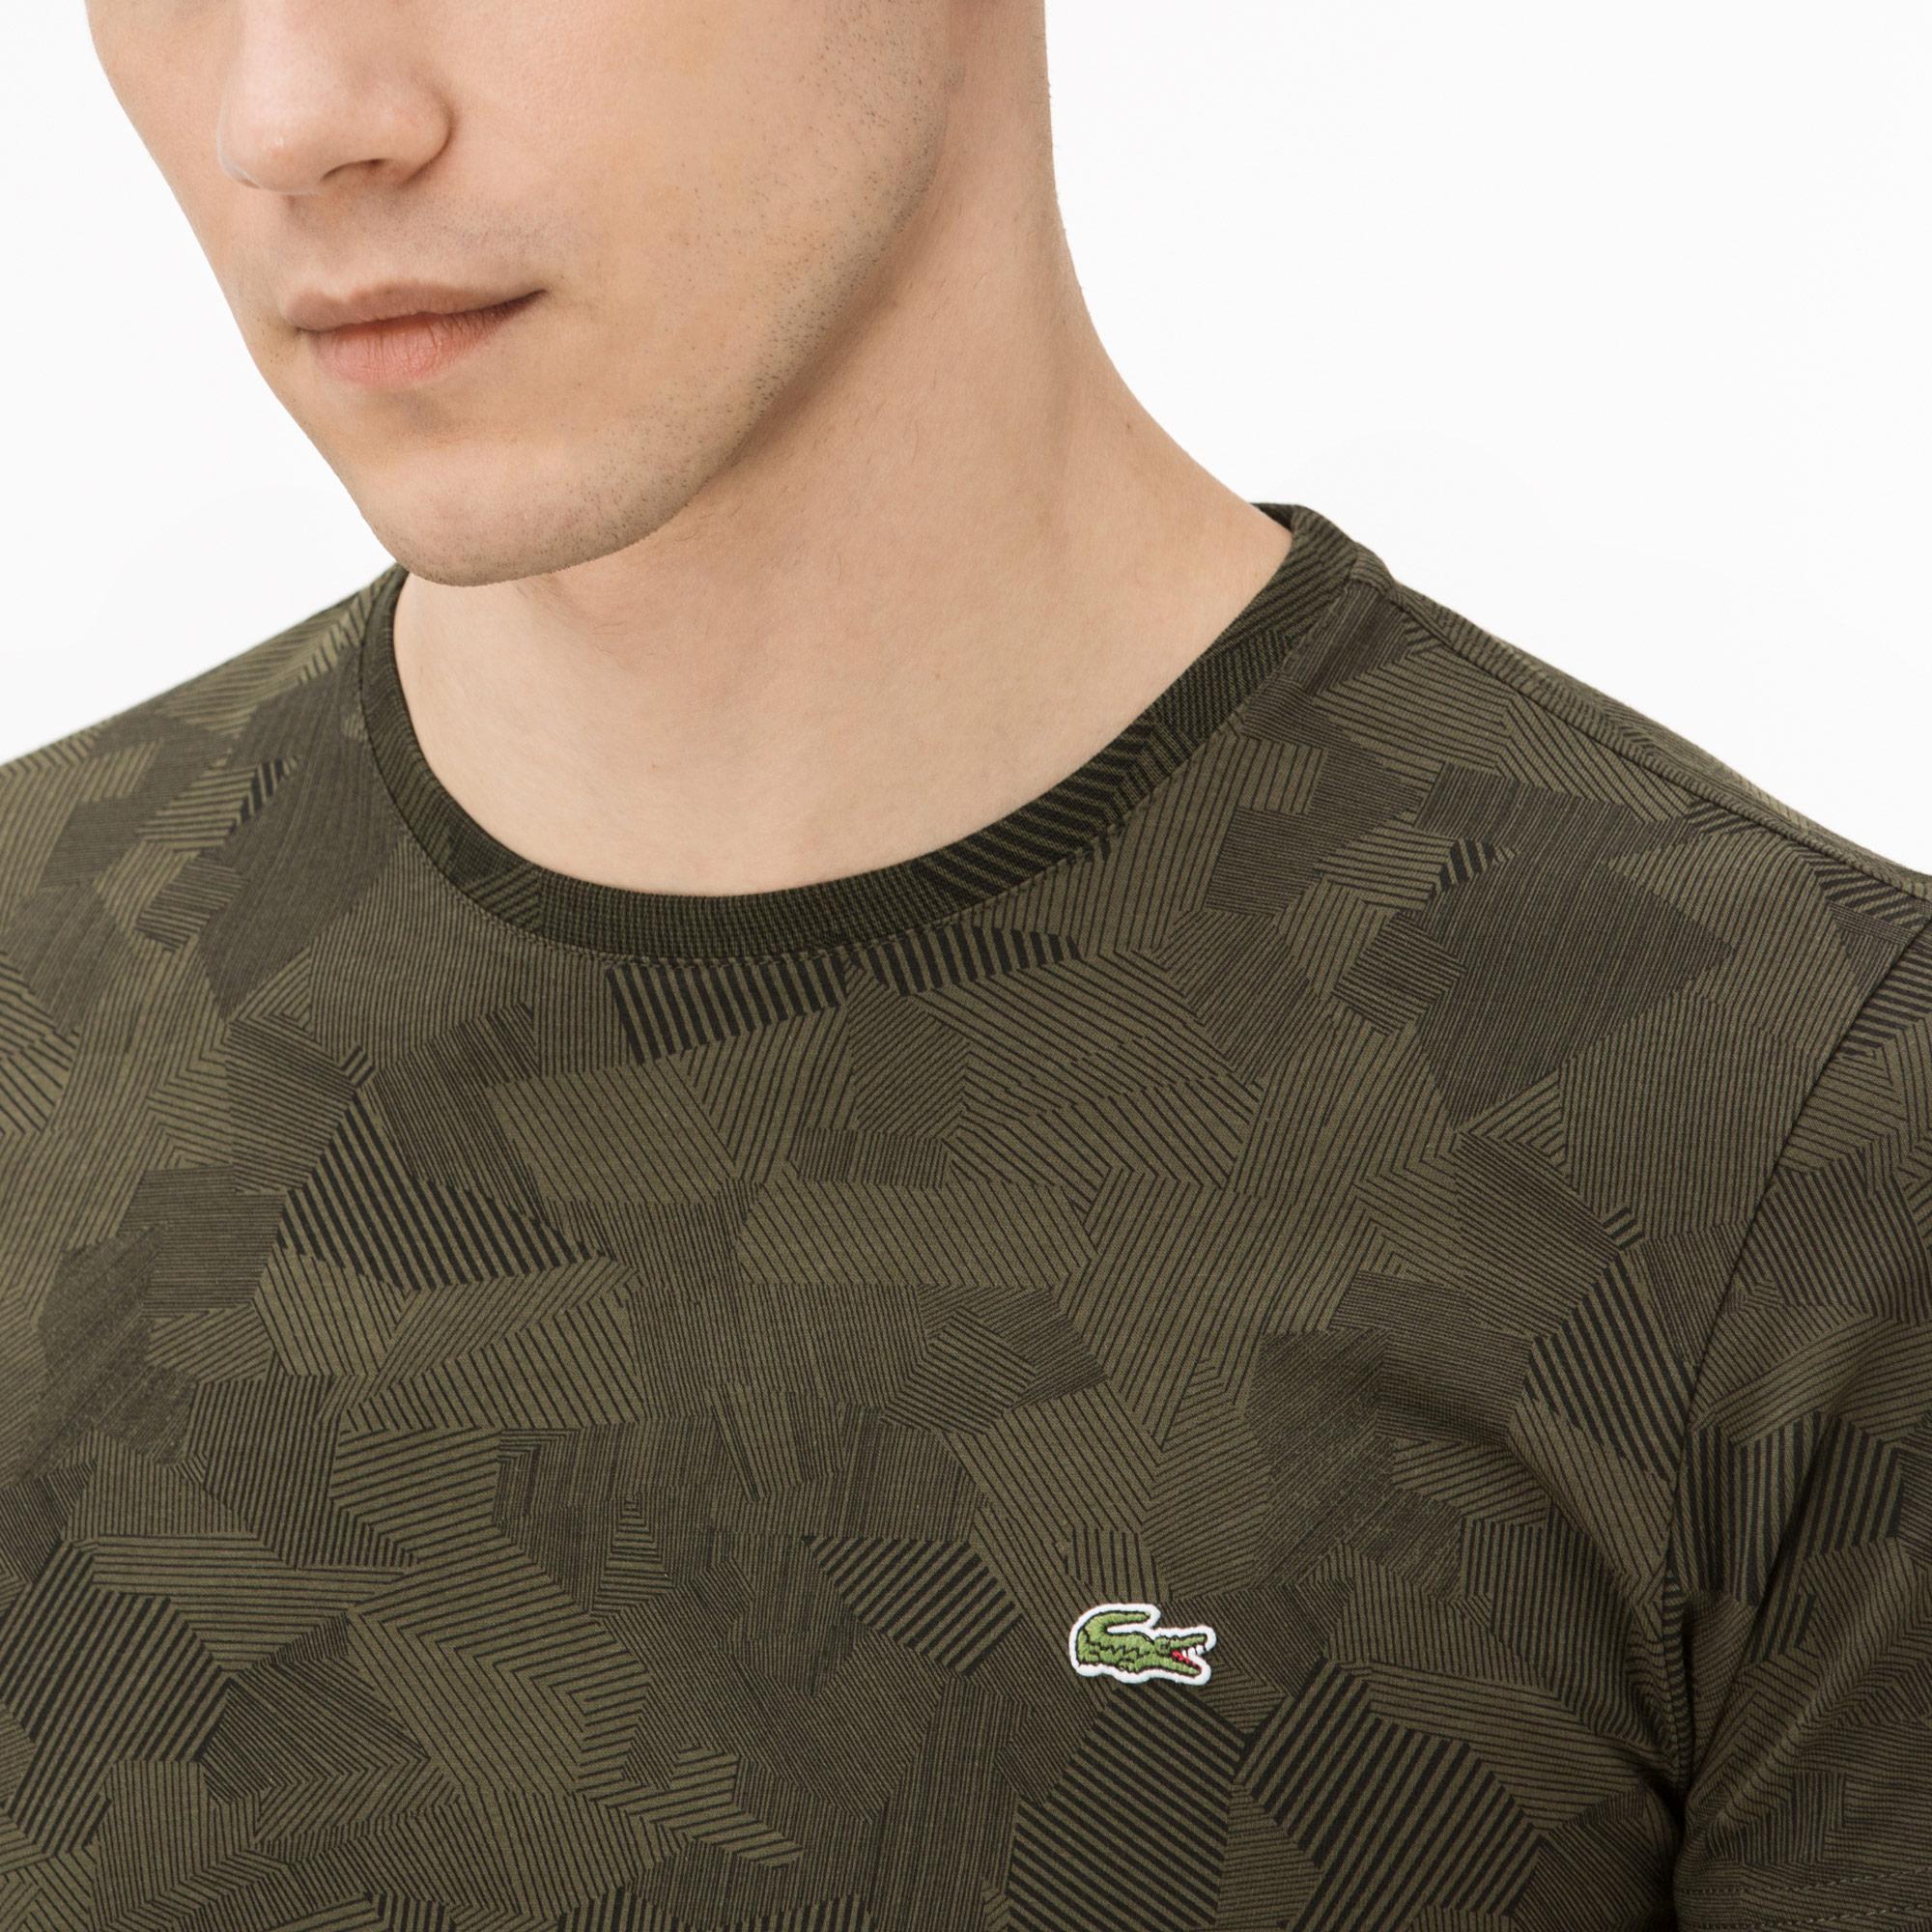 Lacoste Erkek Kamuflaj Yeşil T-Shirt